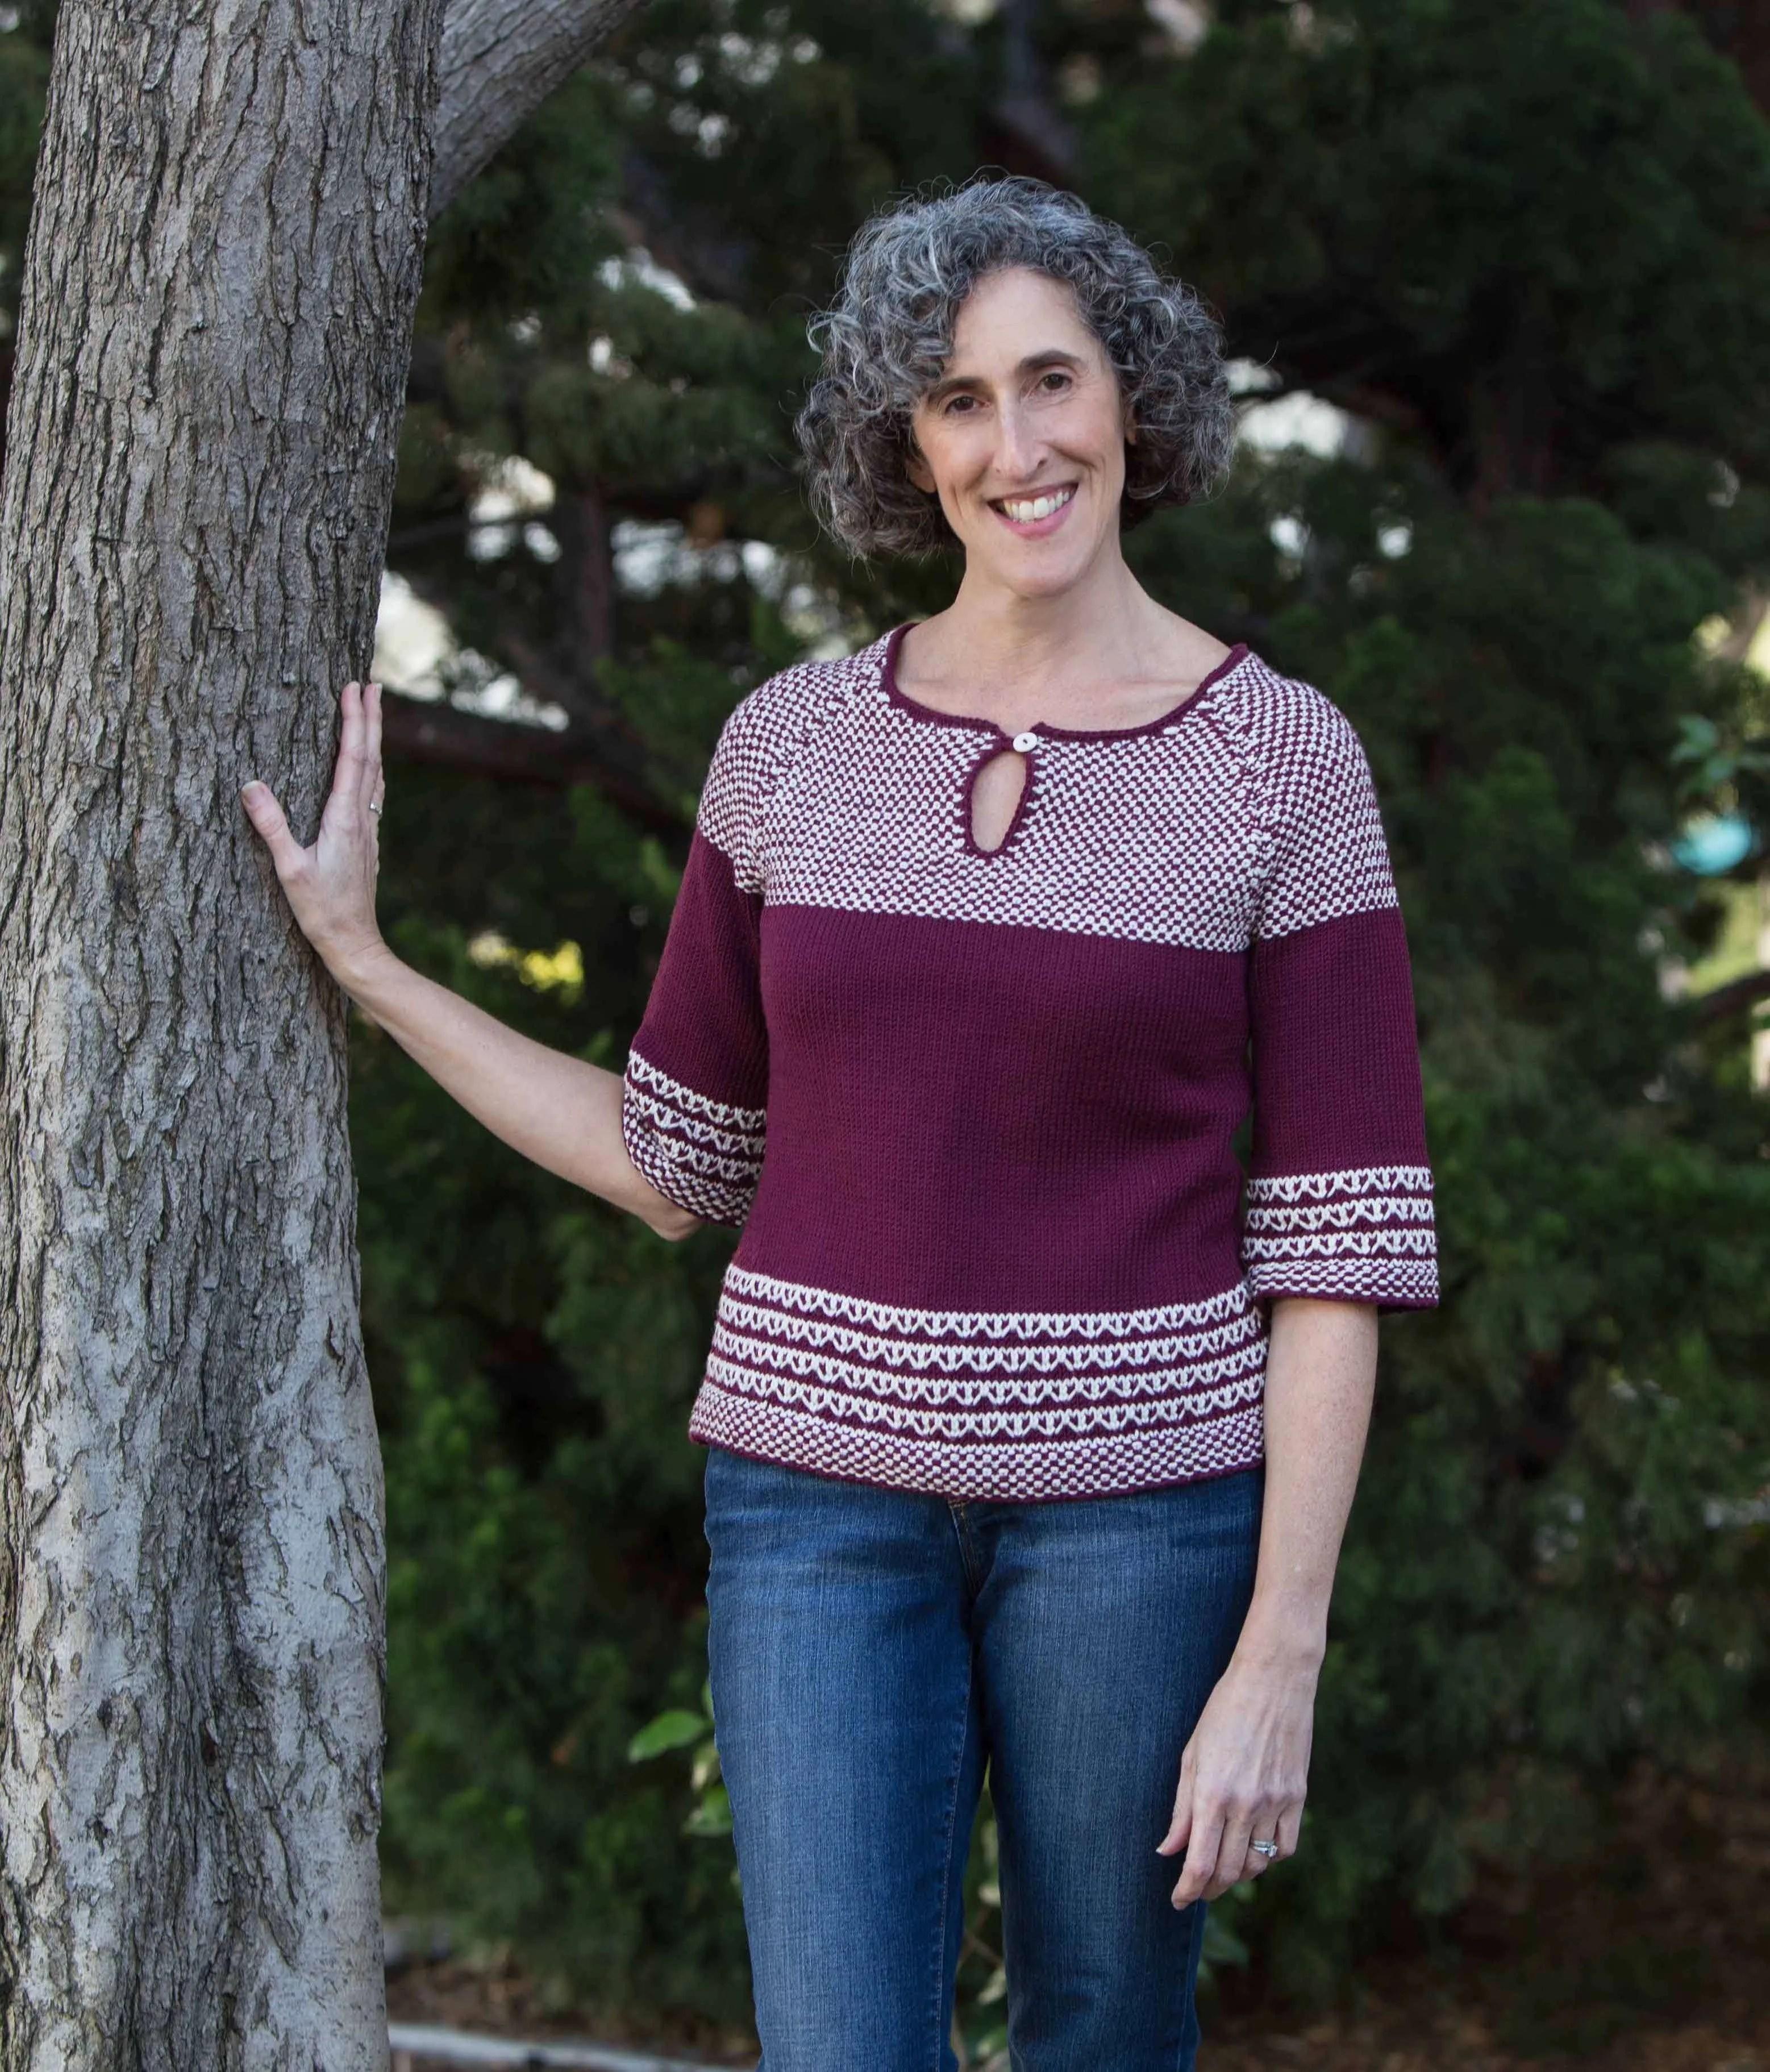 Soho Slip Stitch Video Sweater Class